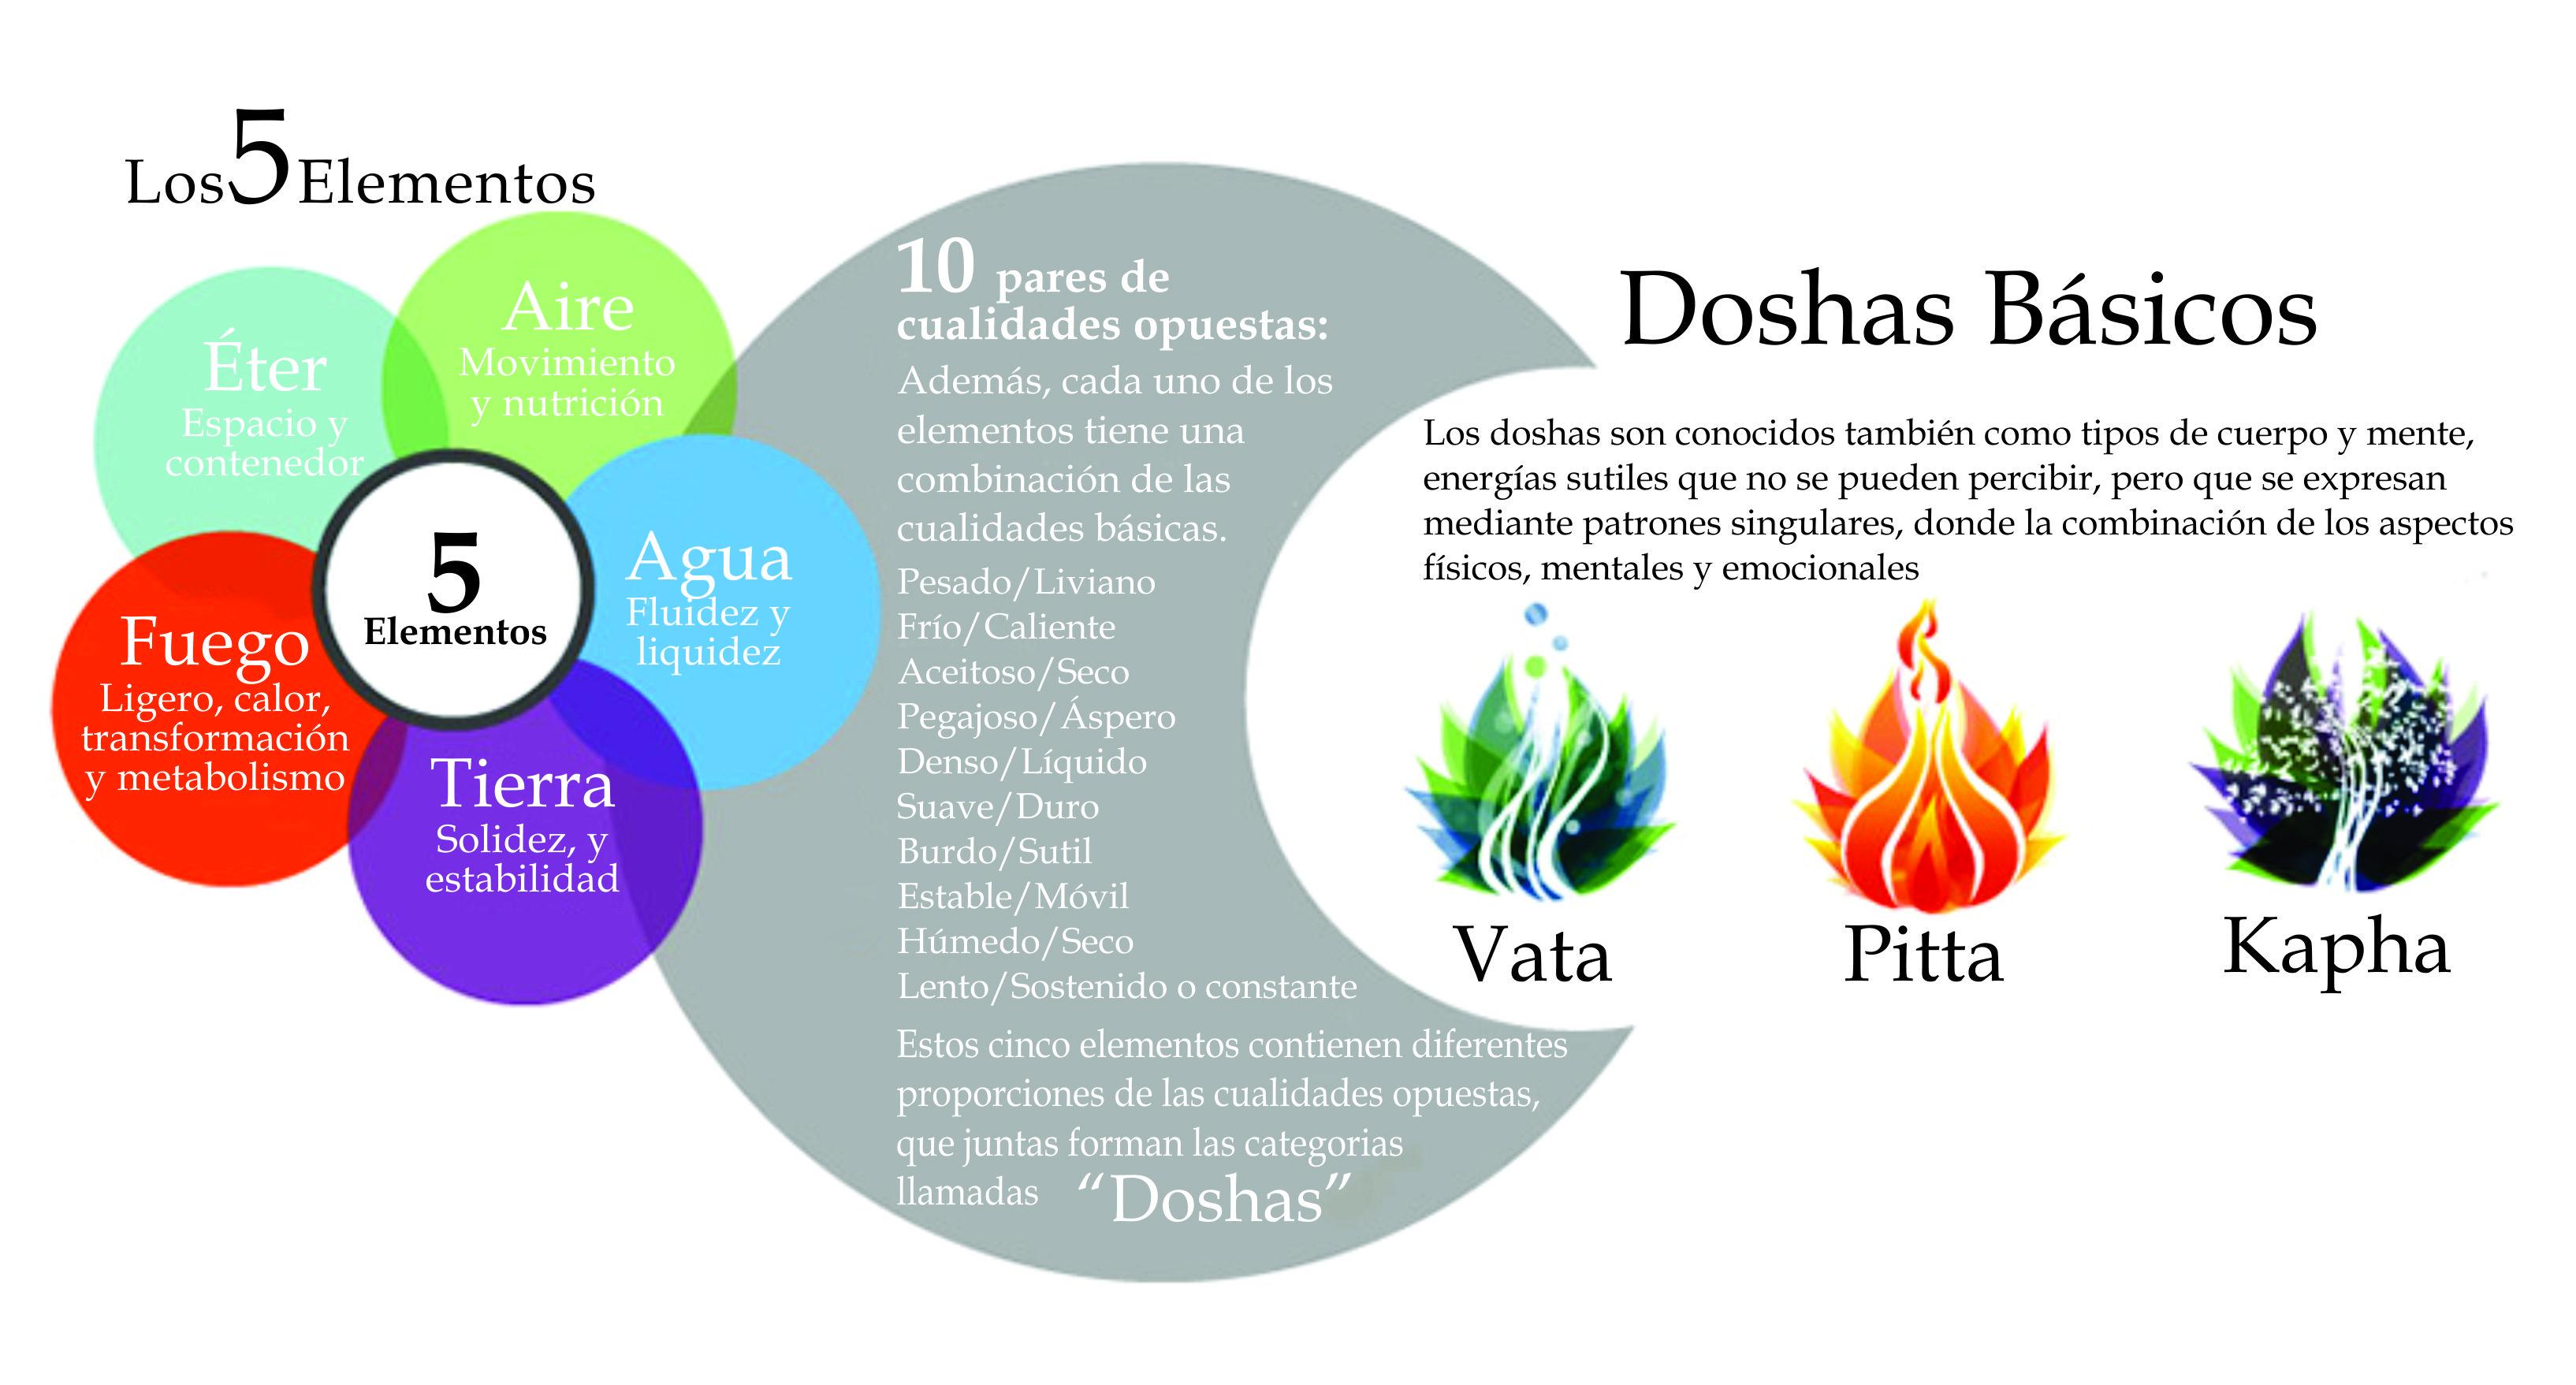 dosha-prana-ayurveda-medicina-india